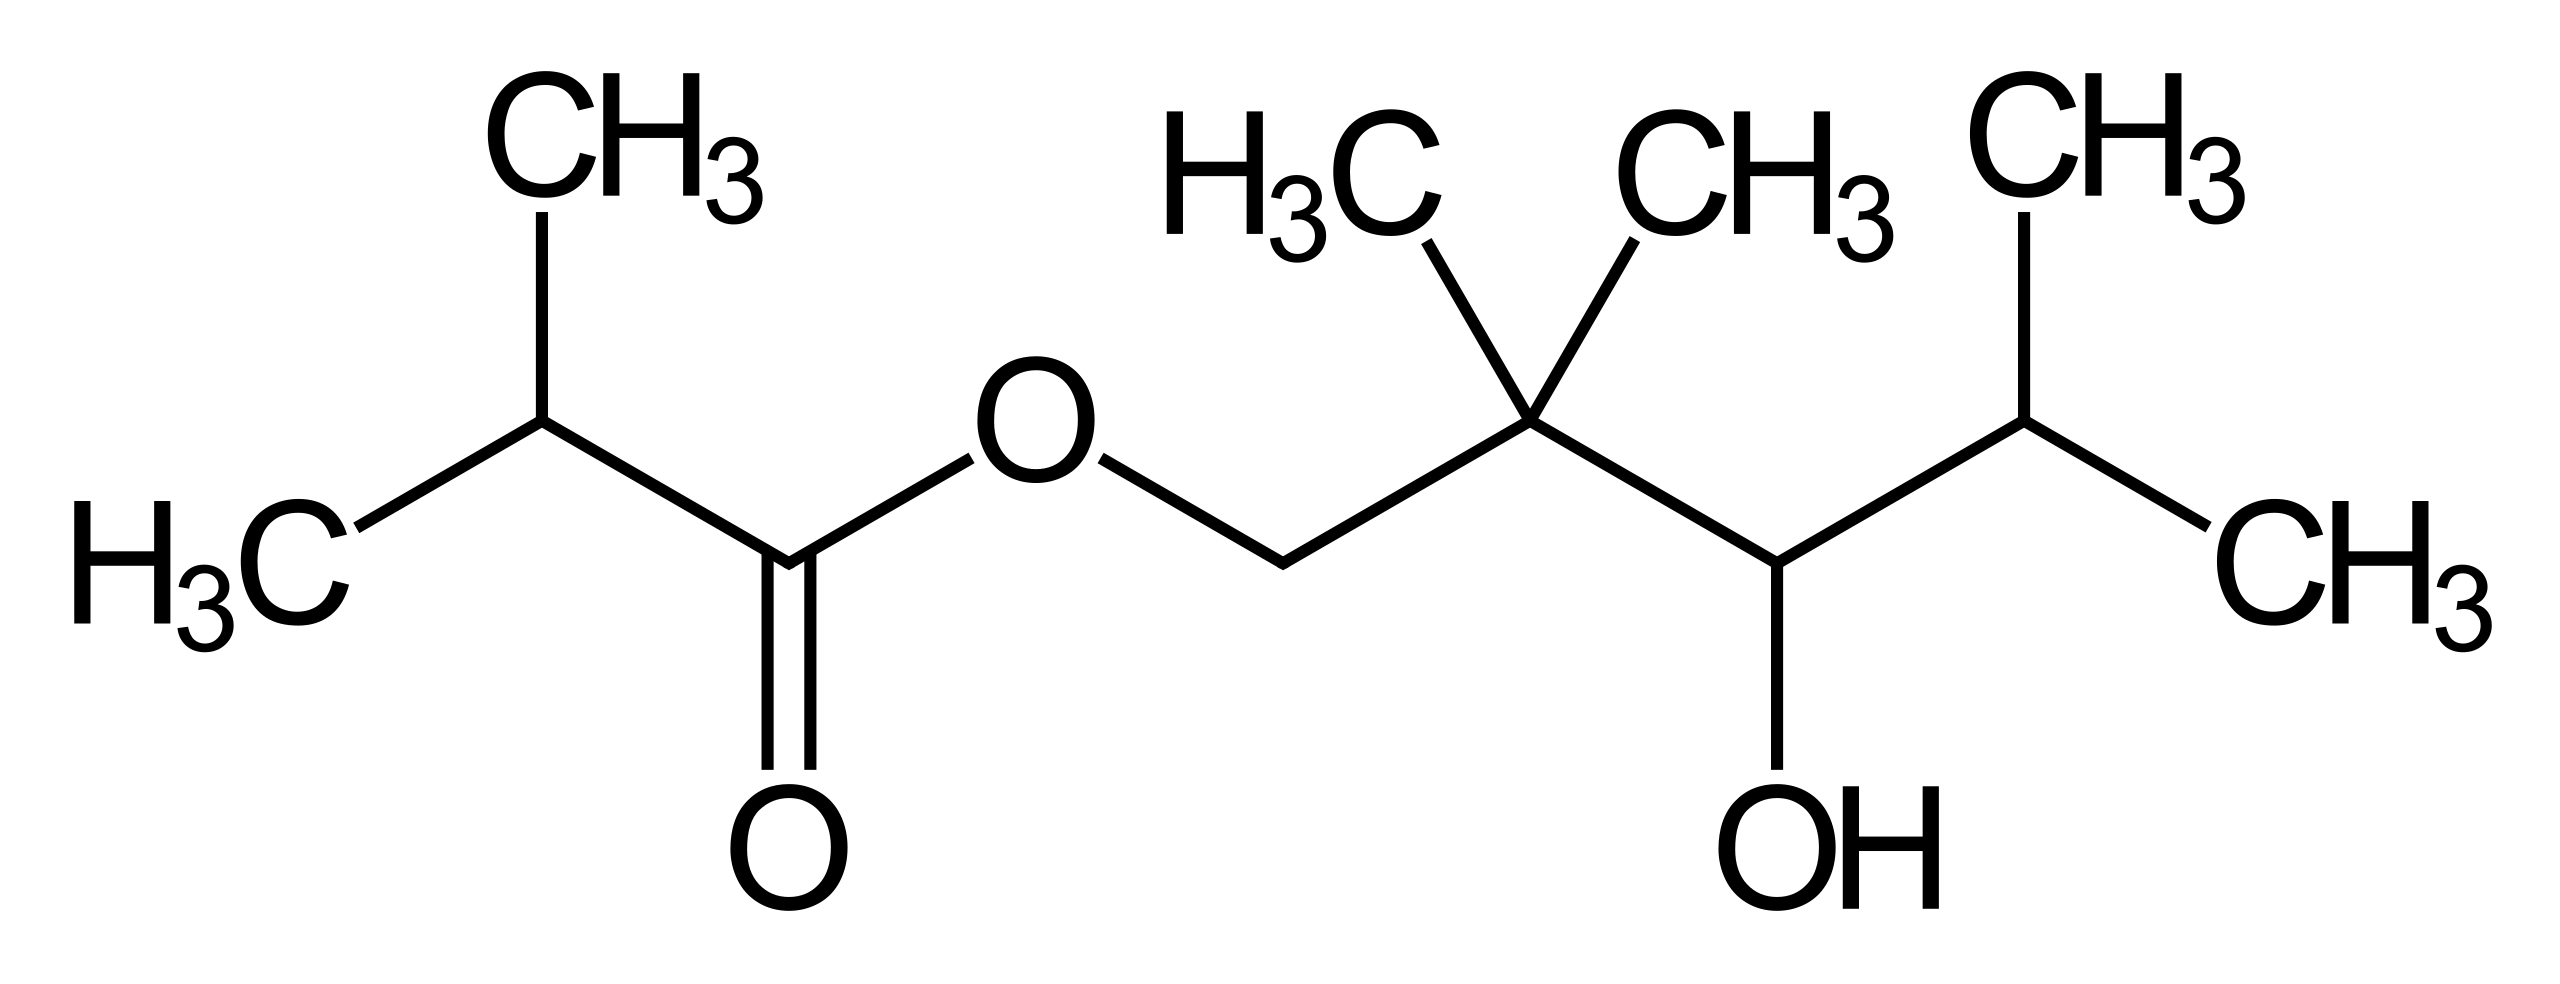 فرمول شیمیایی تگزانول